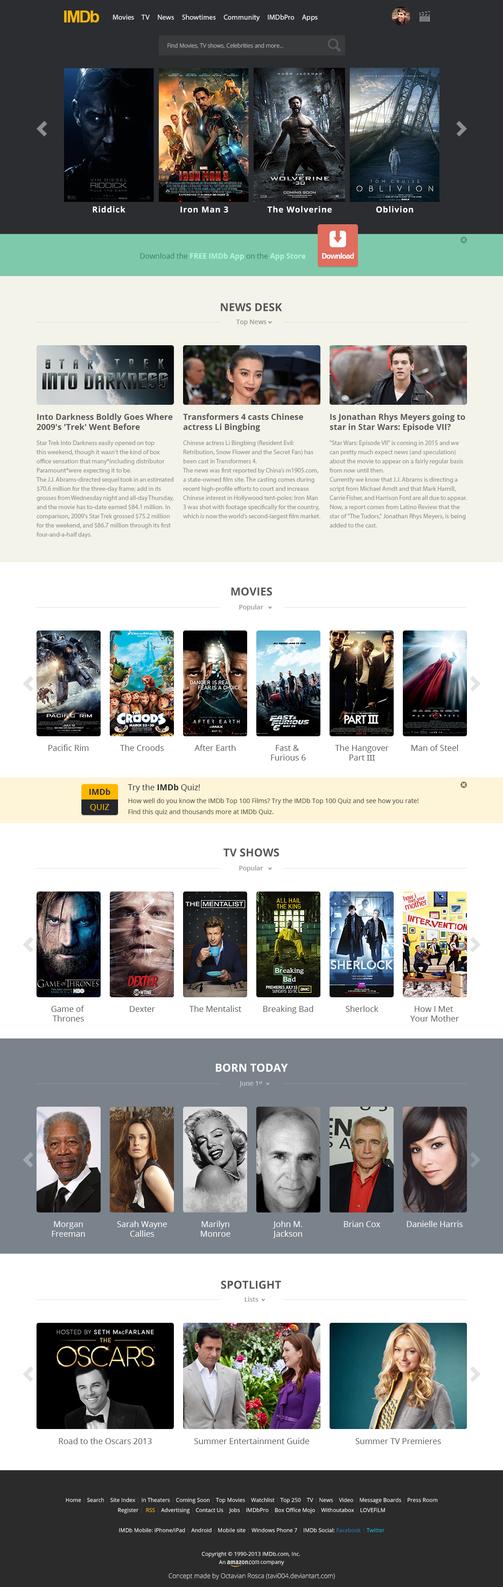 IMDb flat Redesign by tavi004